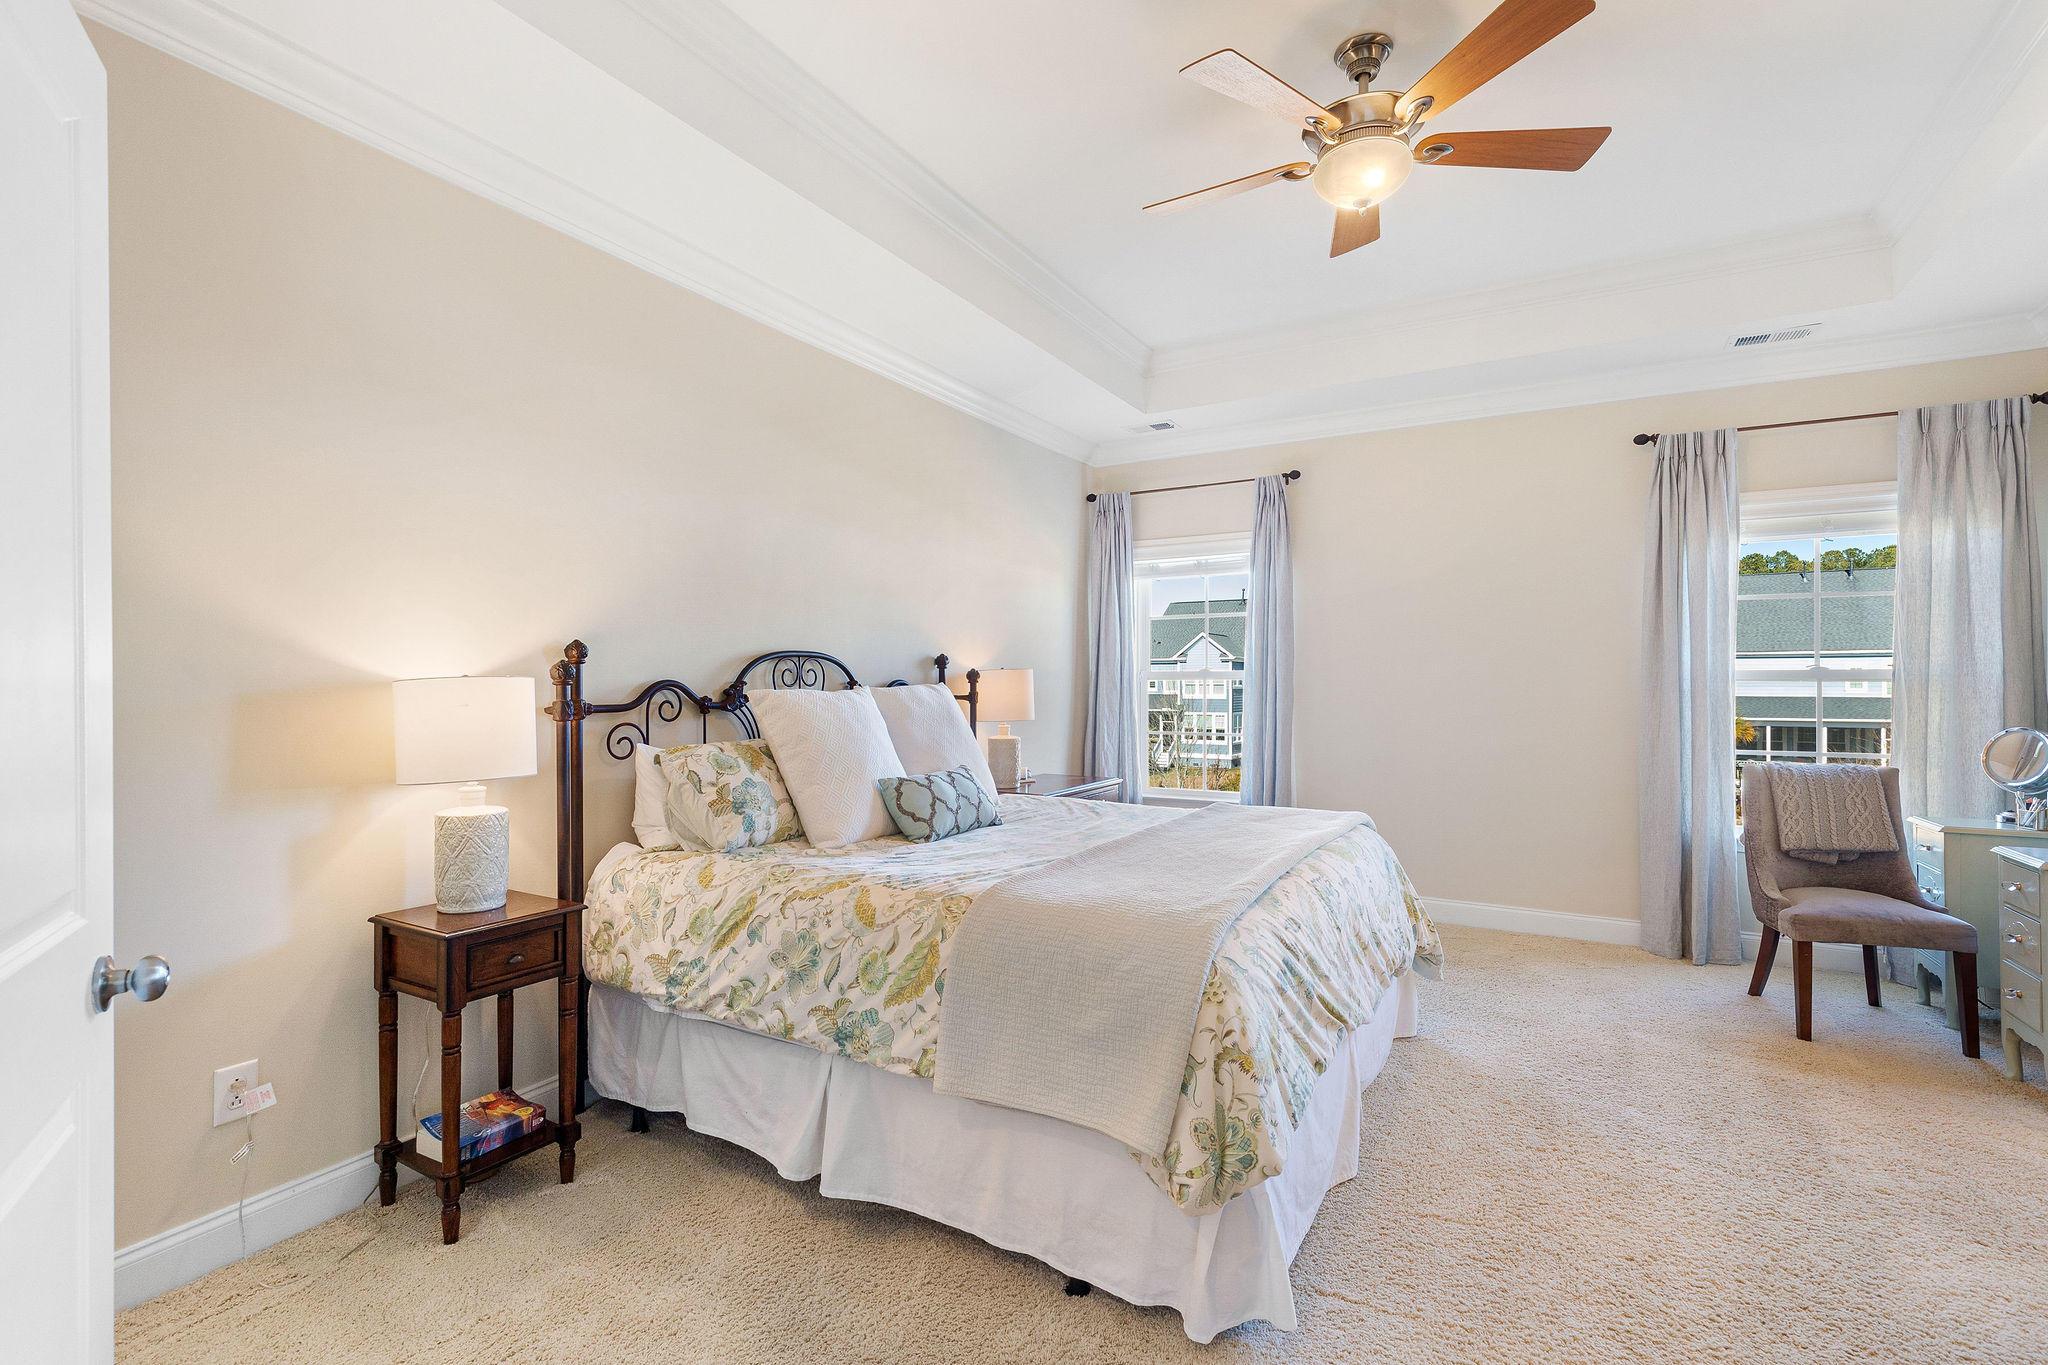 Dunes West Homes For Sale - 3212 Hatchway, Mount Pleasant, SC - 2